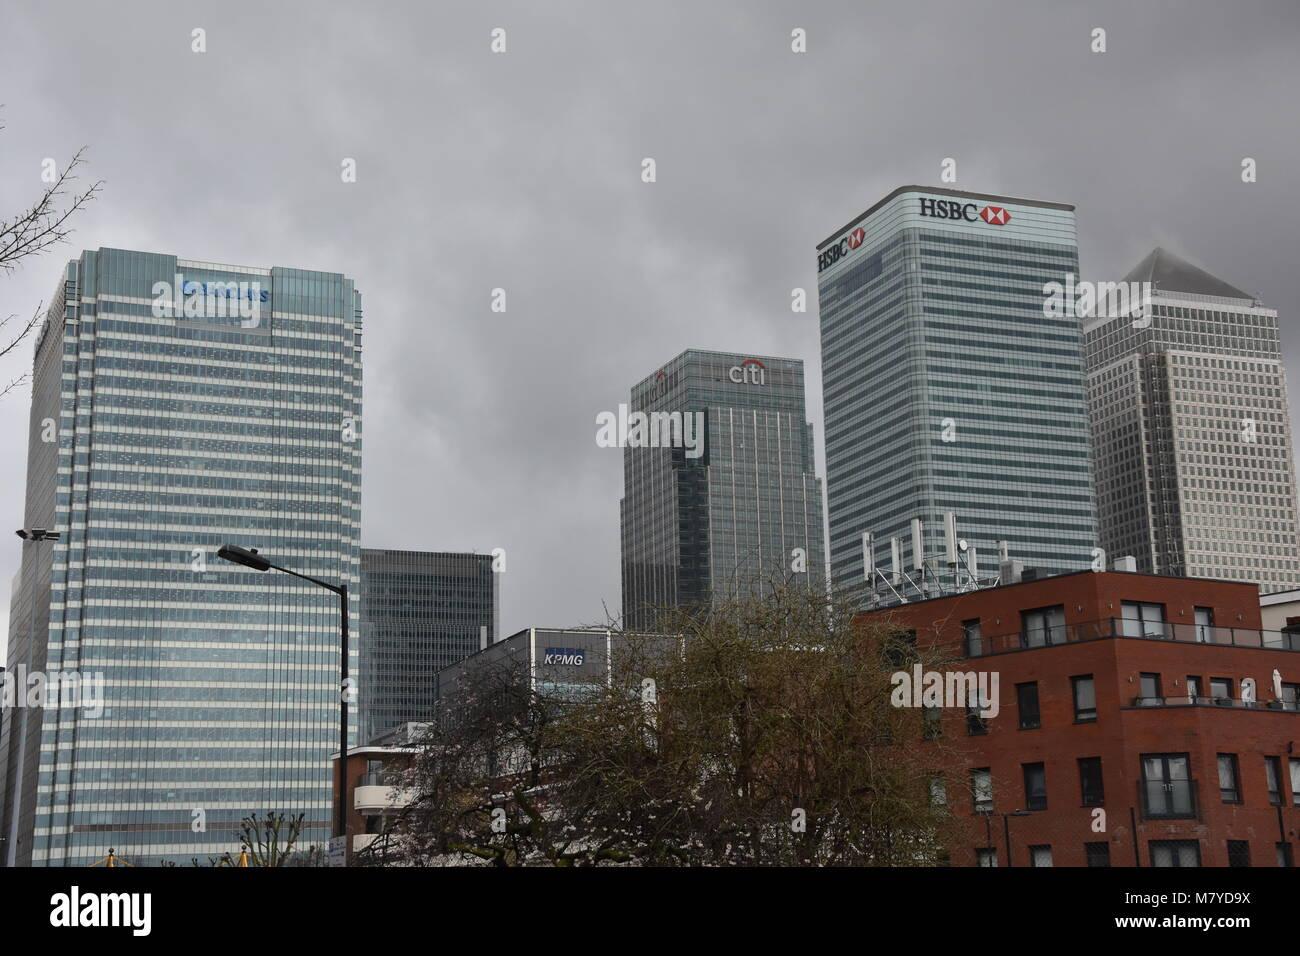 a19c014431 Barclays Bank exterior HQ, además de bloques de oficinas, Canary Wharf,  London Imagen